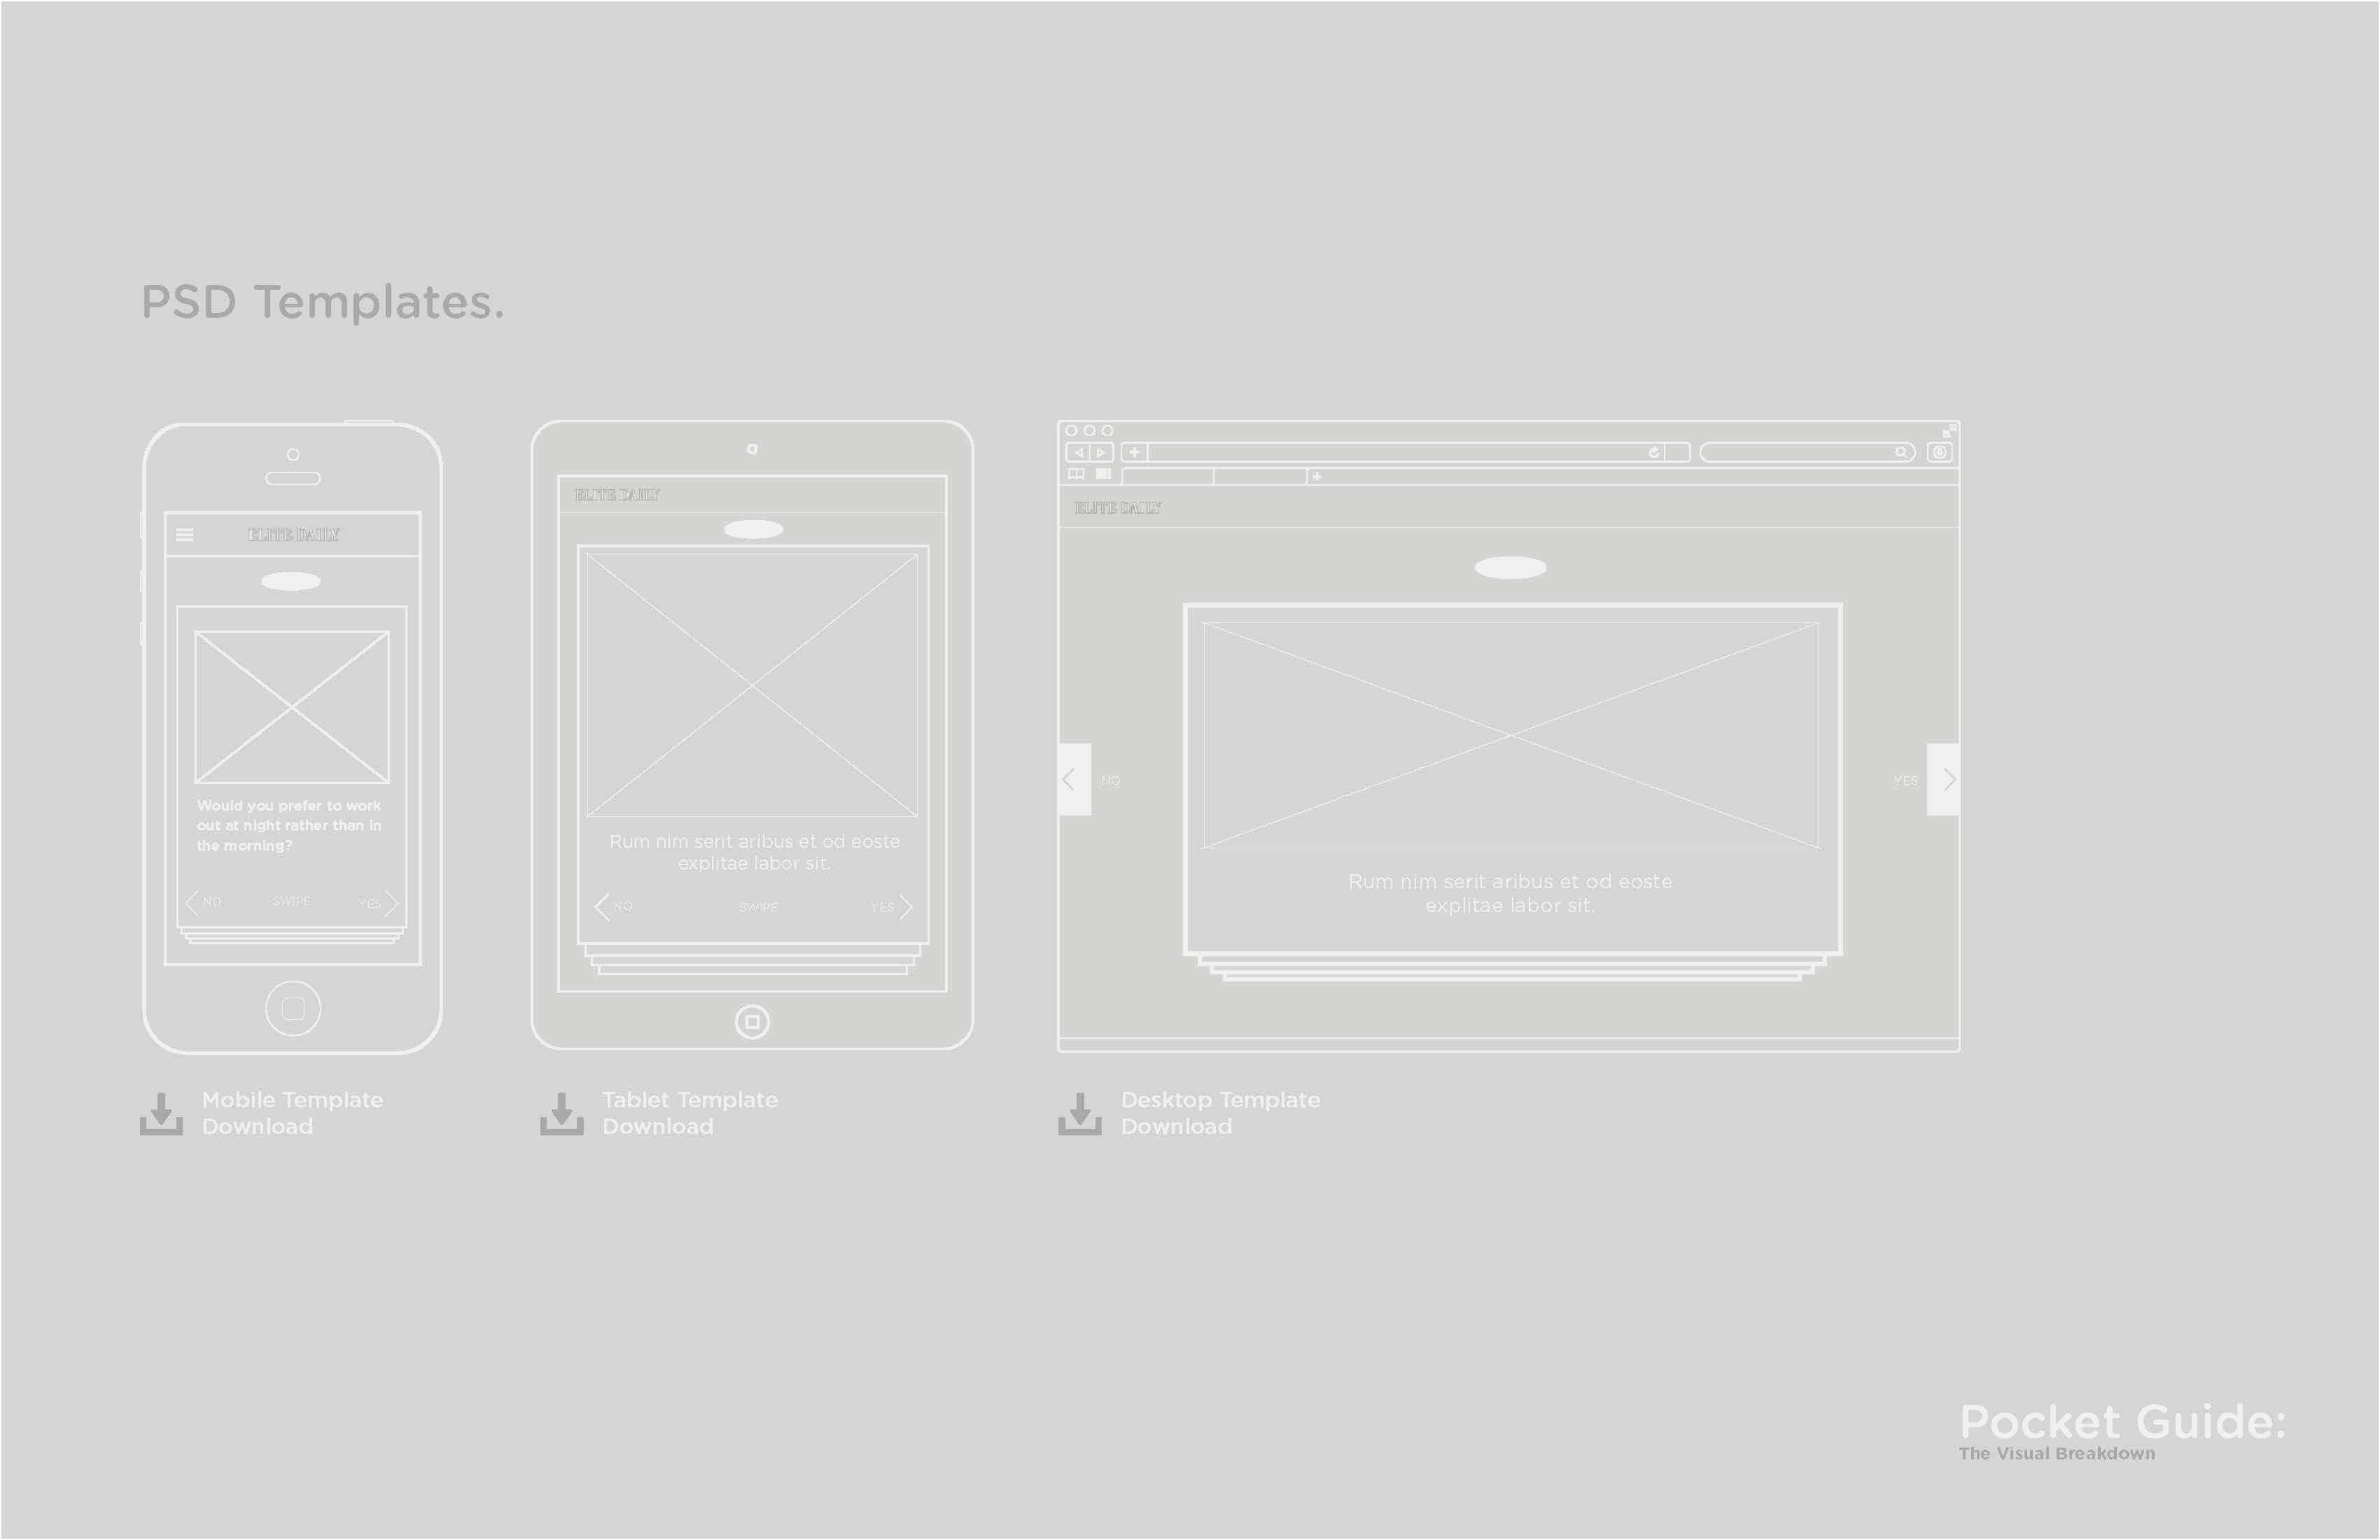 How To Make A Venn Diagram On Word Free 59 Venn Diagram Template Word Sample Free Professional